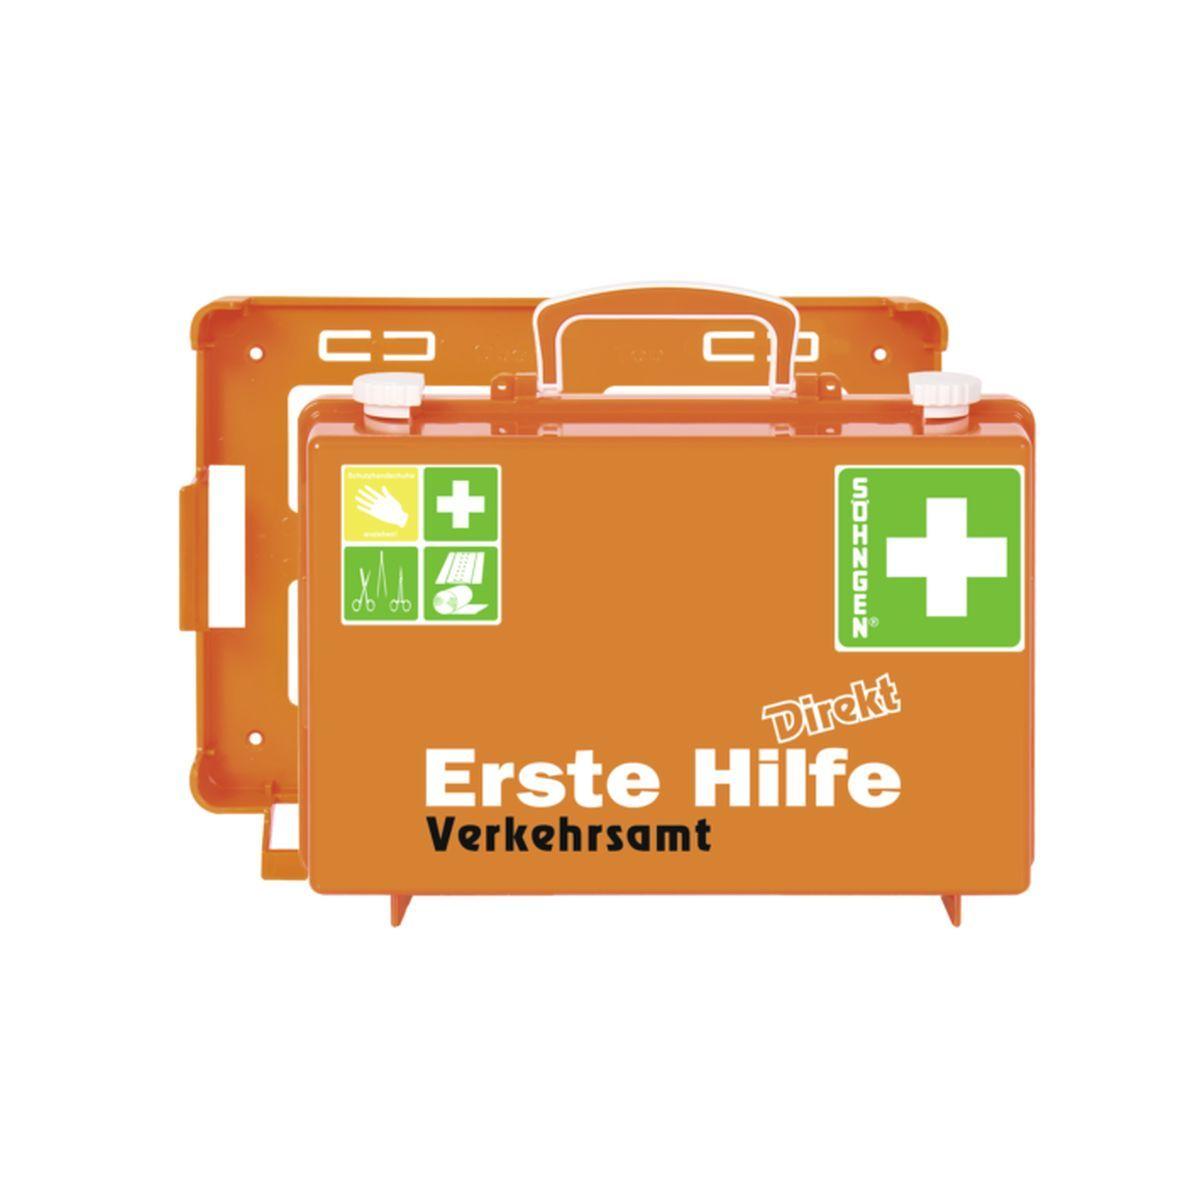 Erste Hilfe Koffer DIN 13157 DIREKT, Verkehrsamt